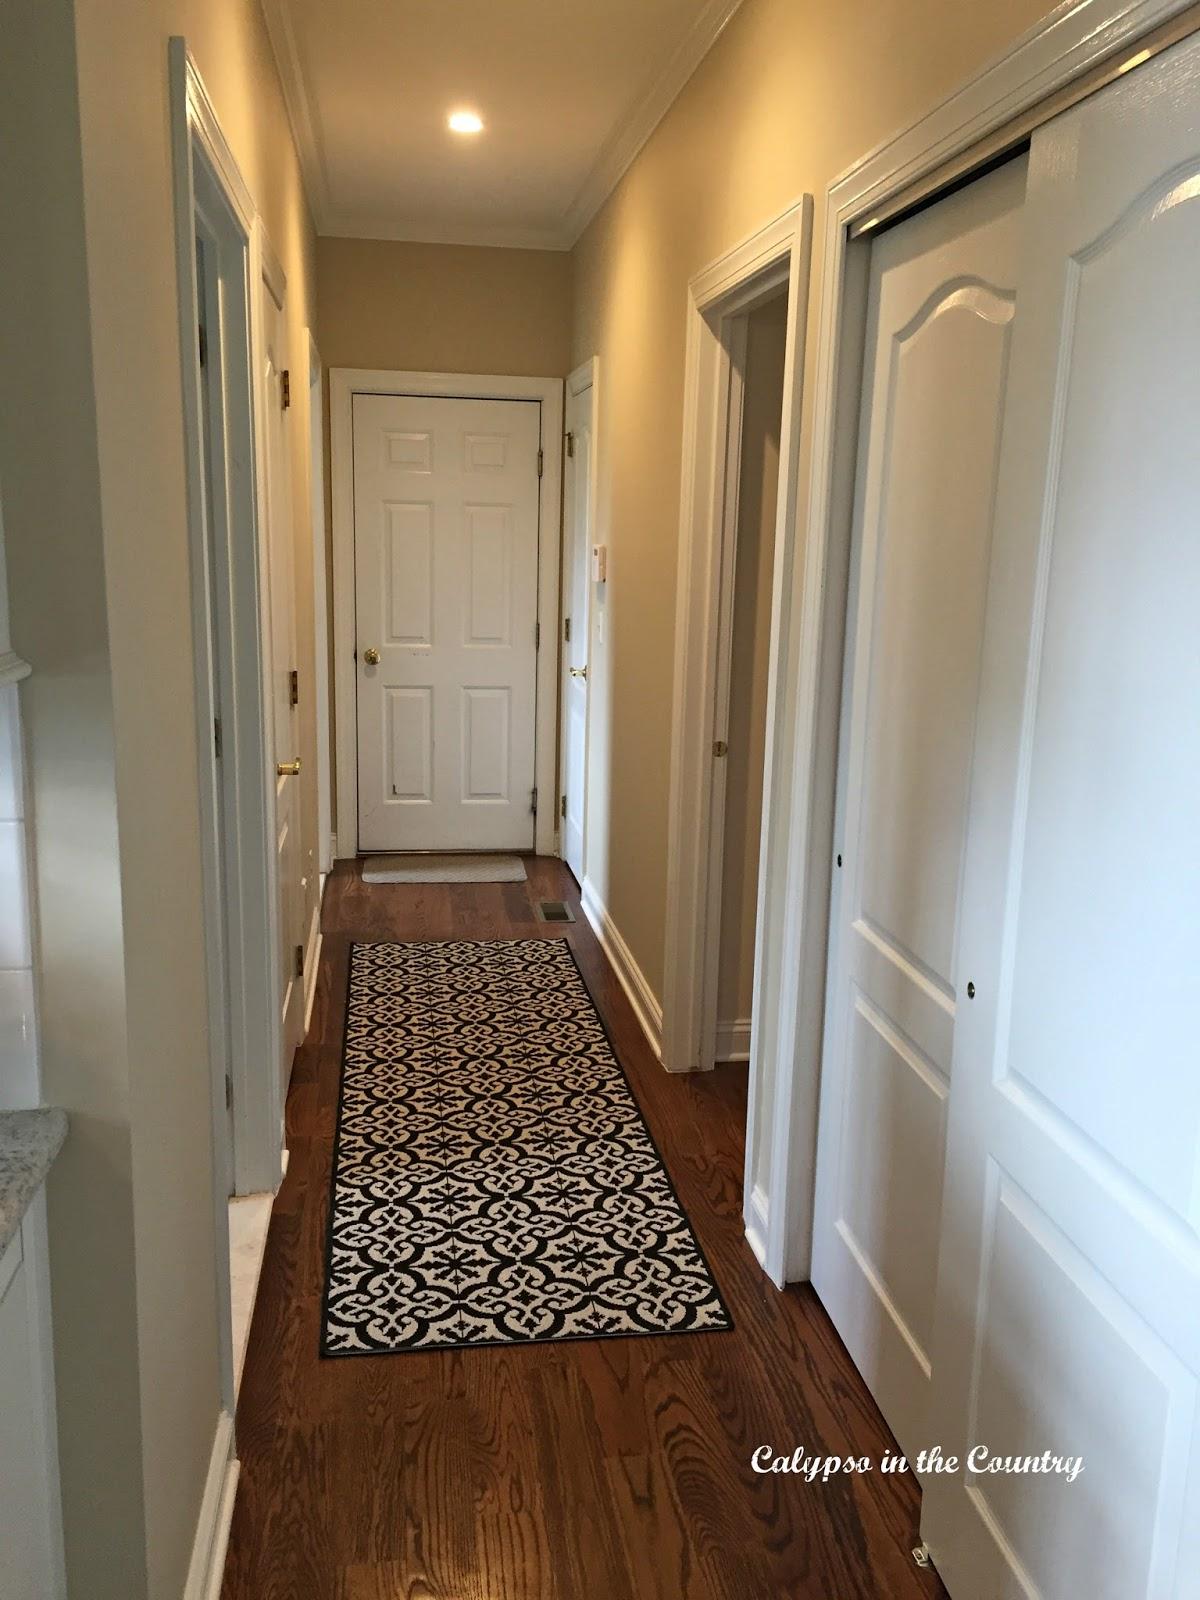 Hallway with tile-look runner